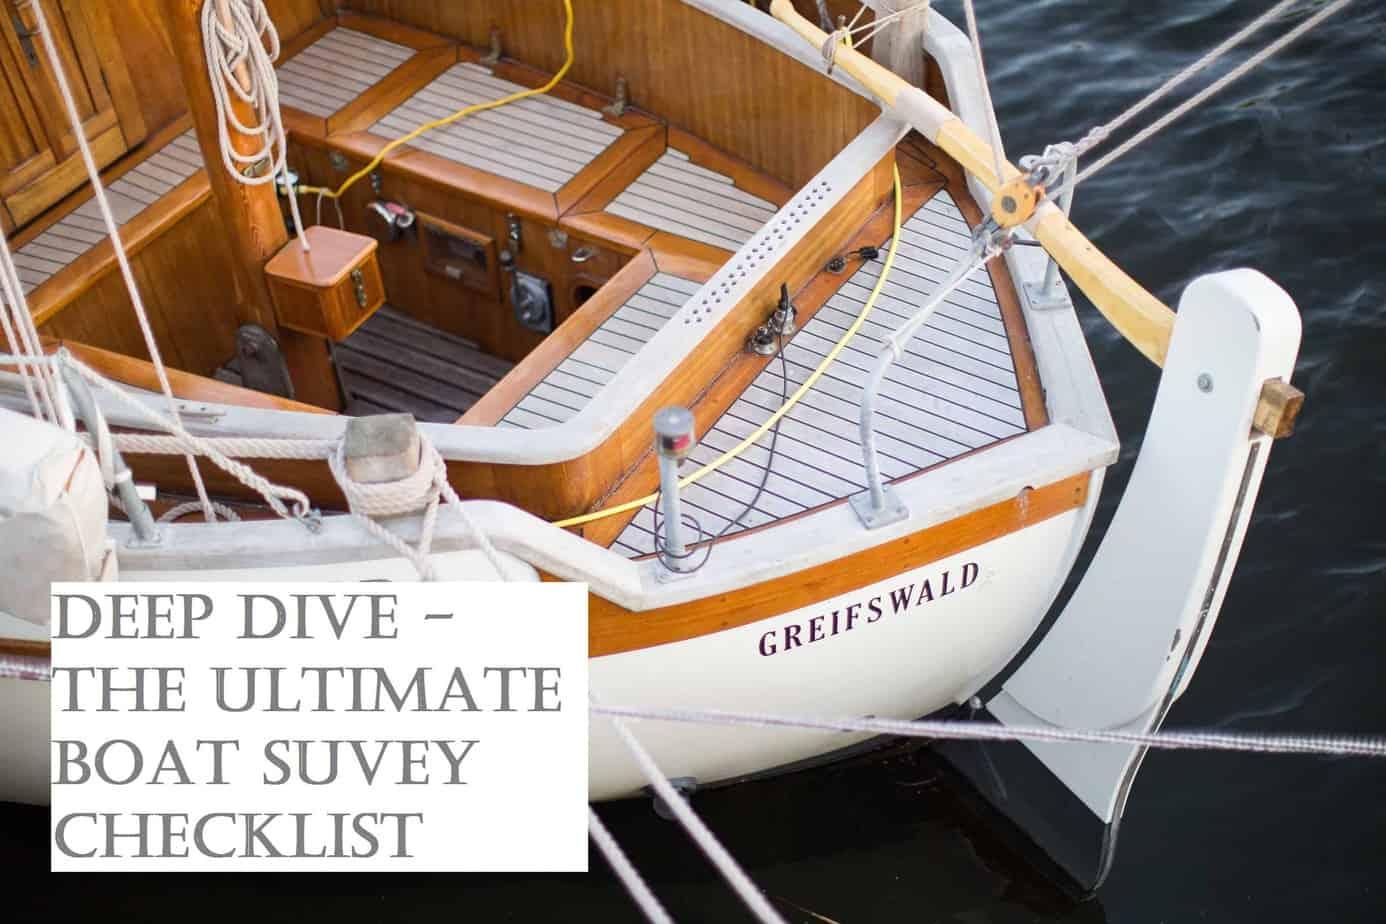 Deep Dive The Ultimate Boat Survey Checklist